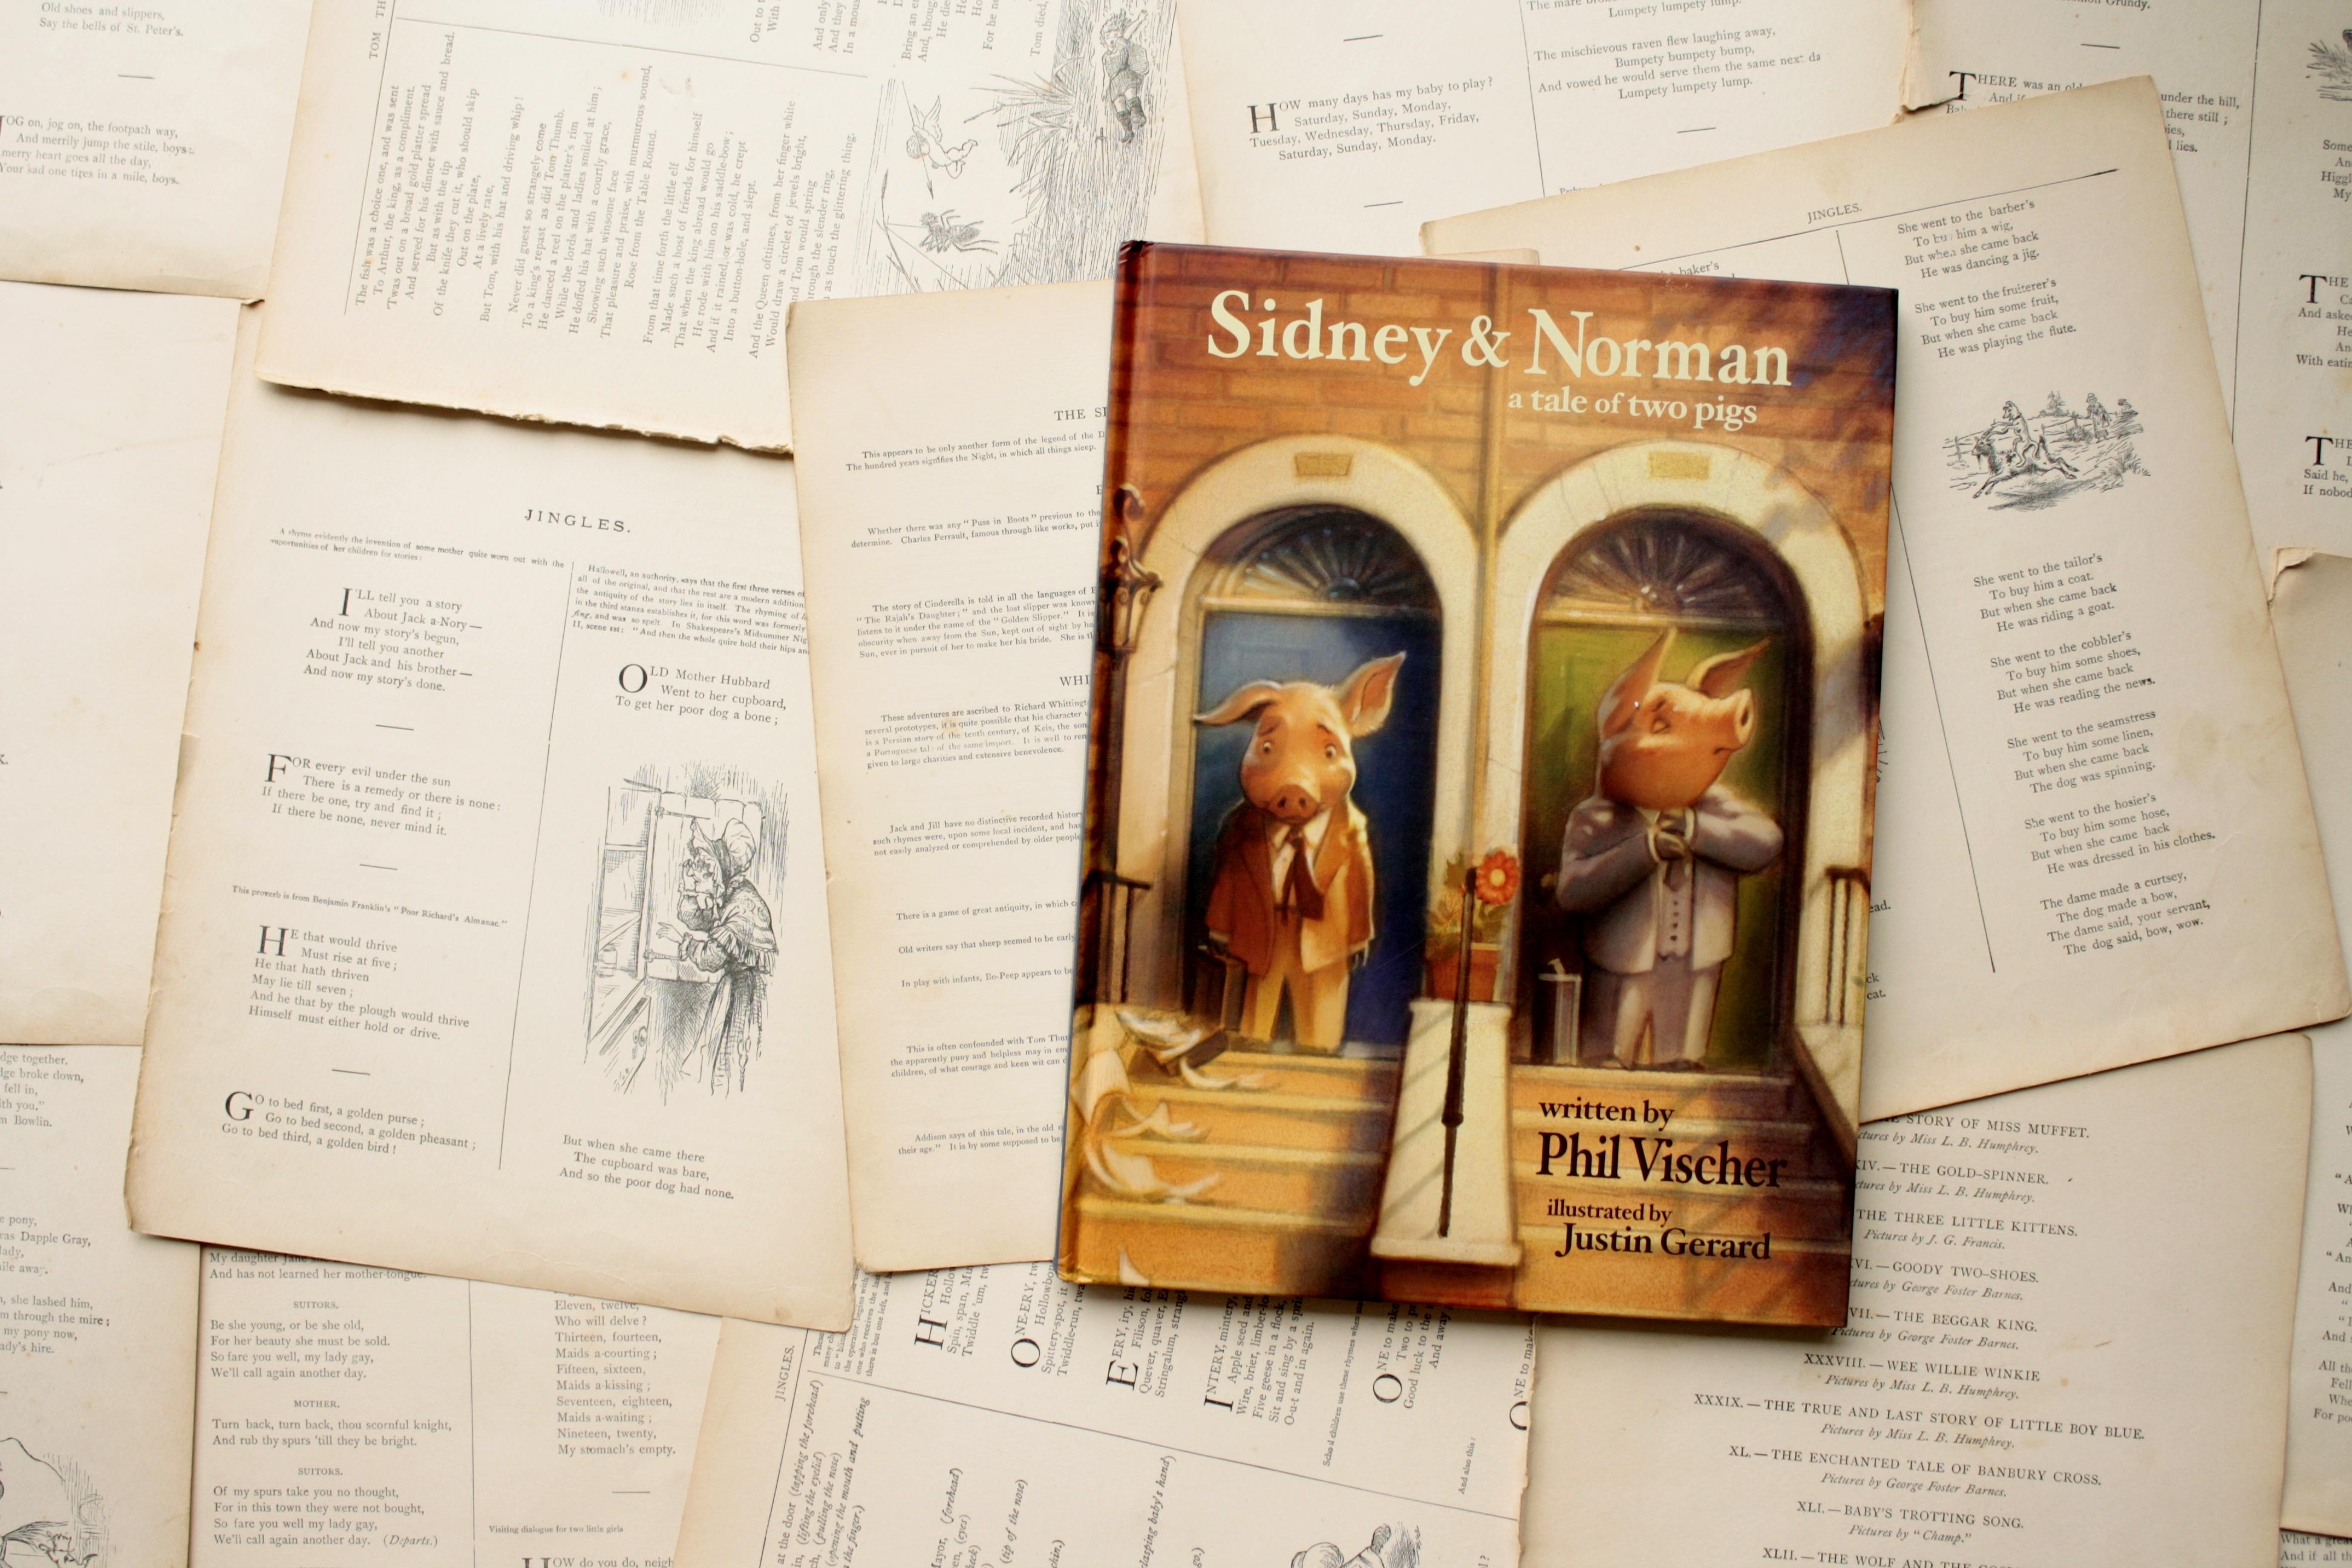 Sidney and Norman | Phil Vischer